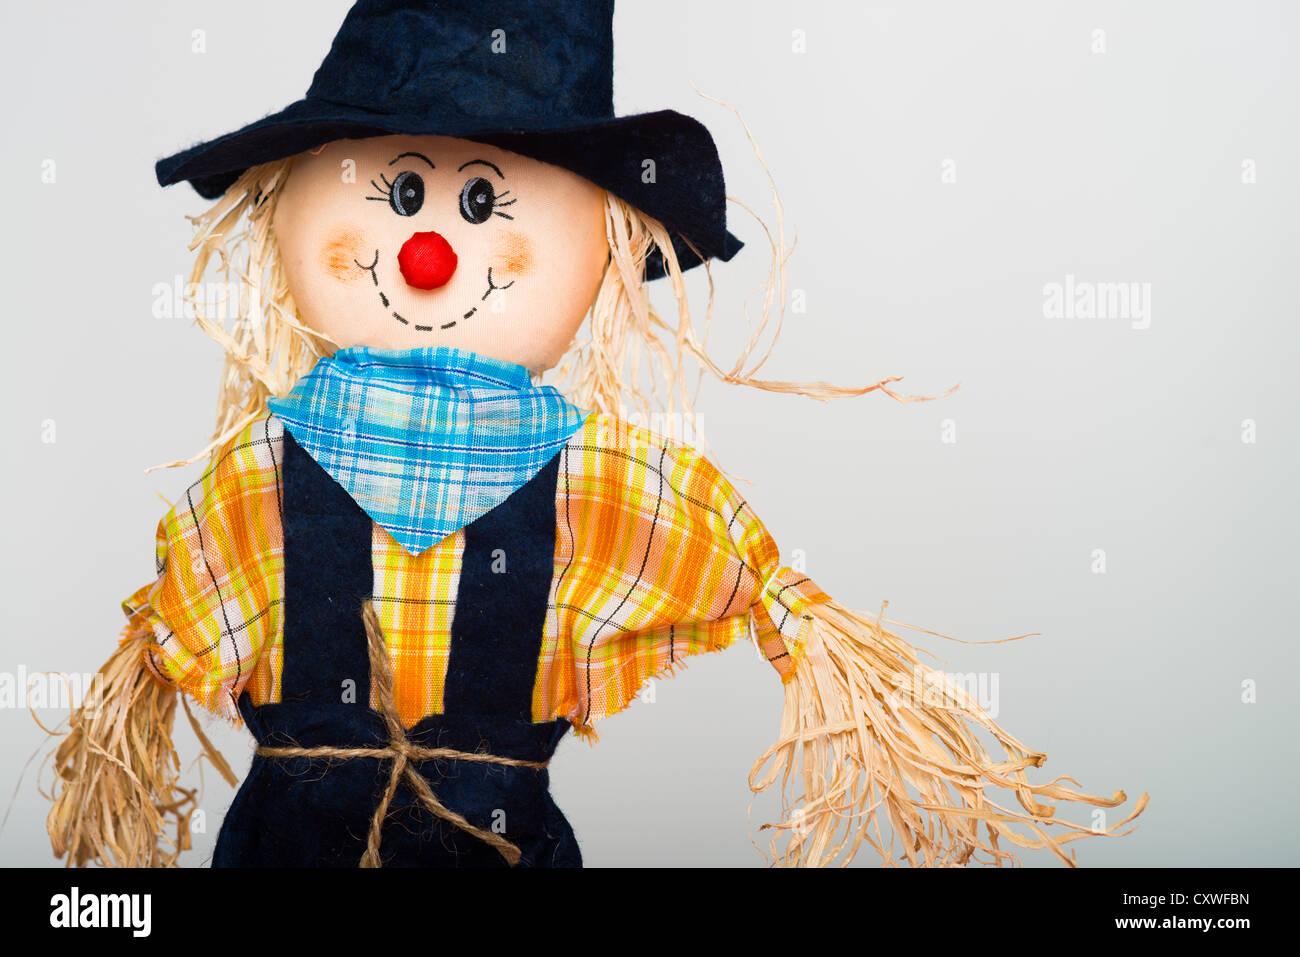 Halloween straw scarecrow doll - Stock Image